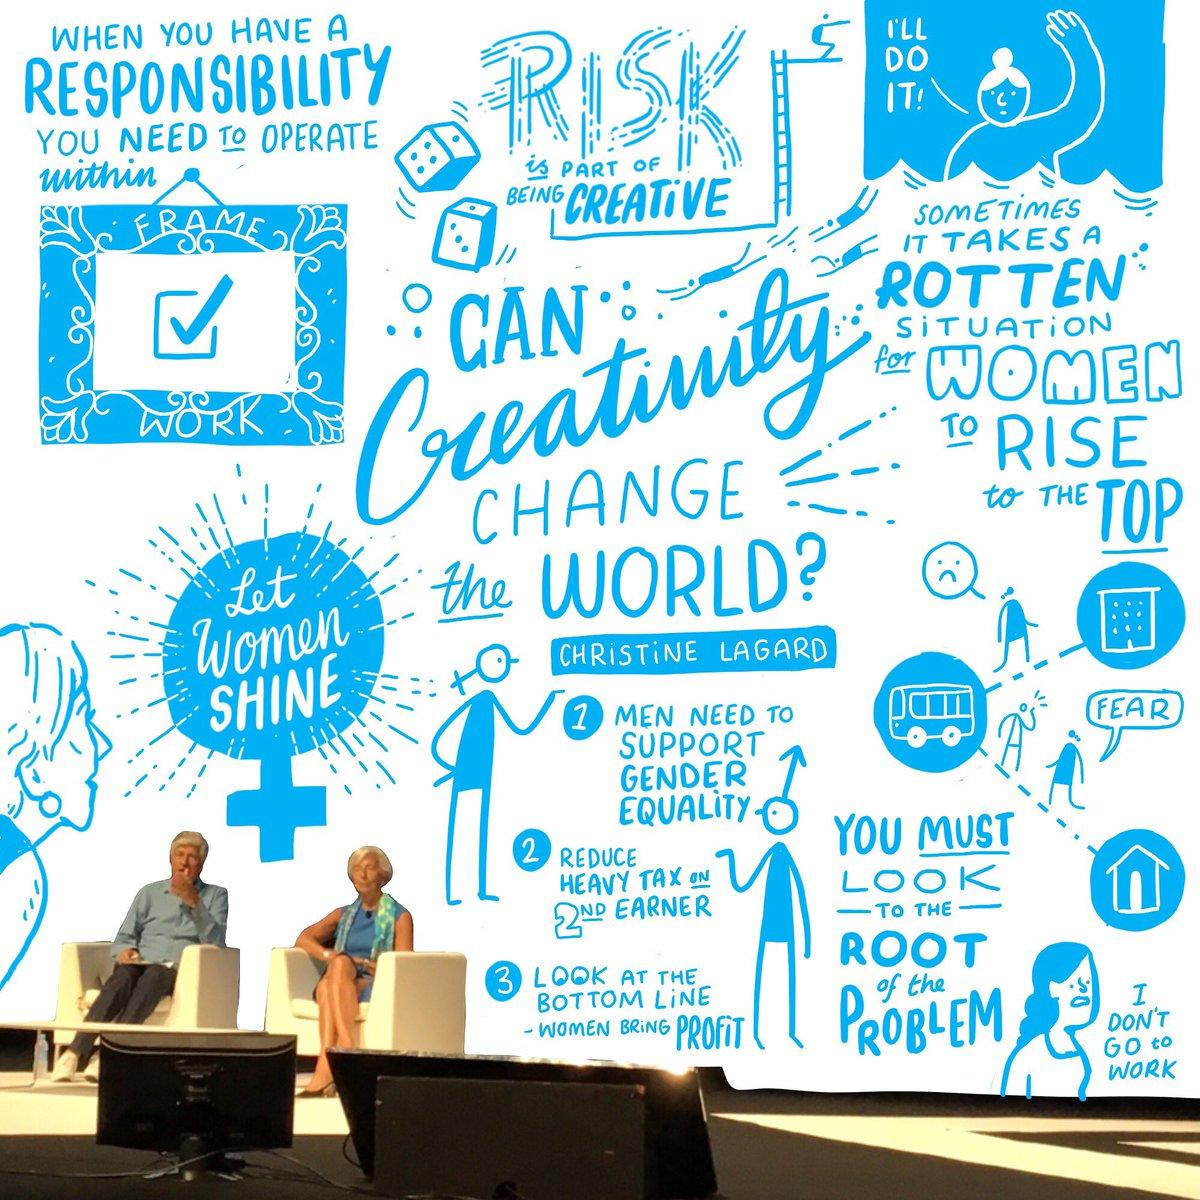 can creativity change the world .jpg